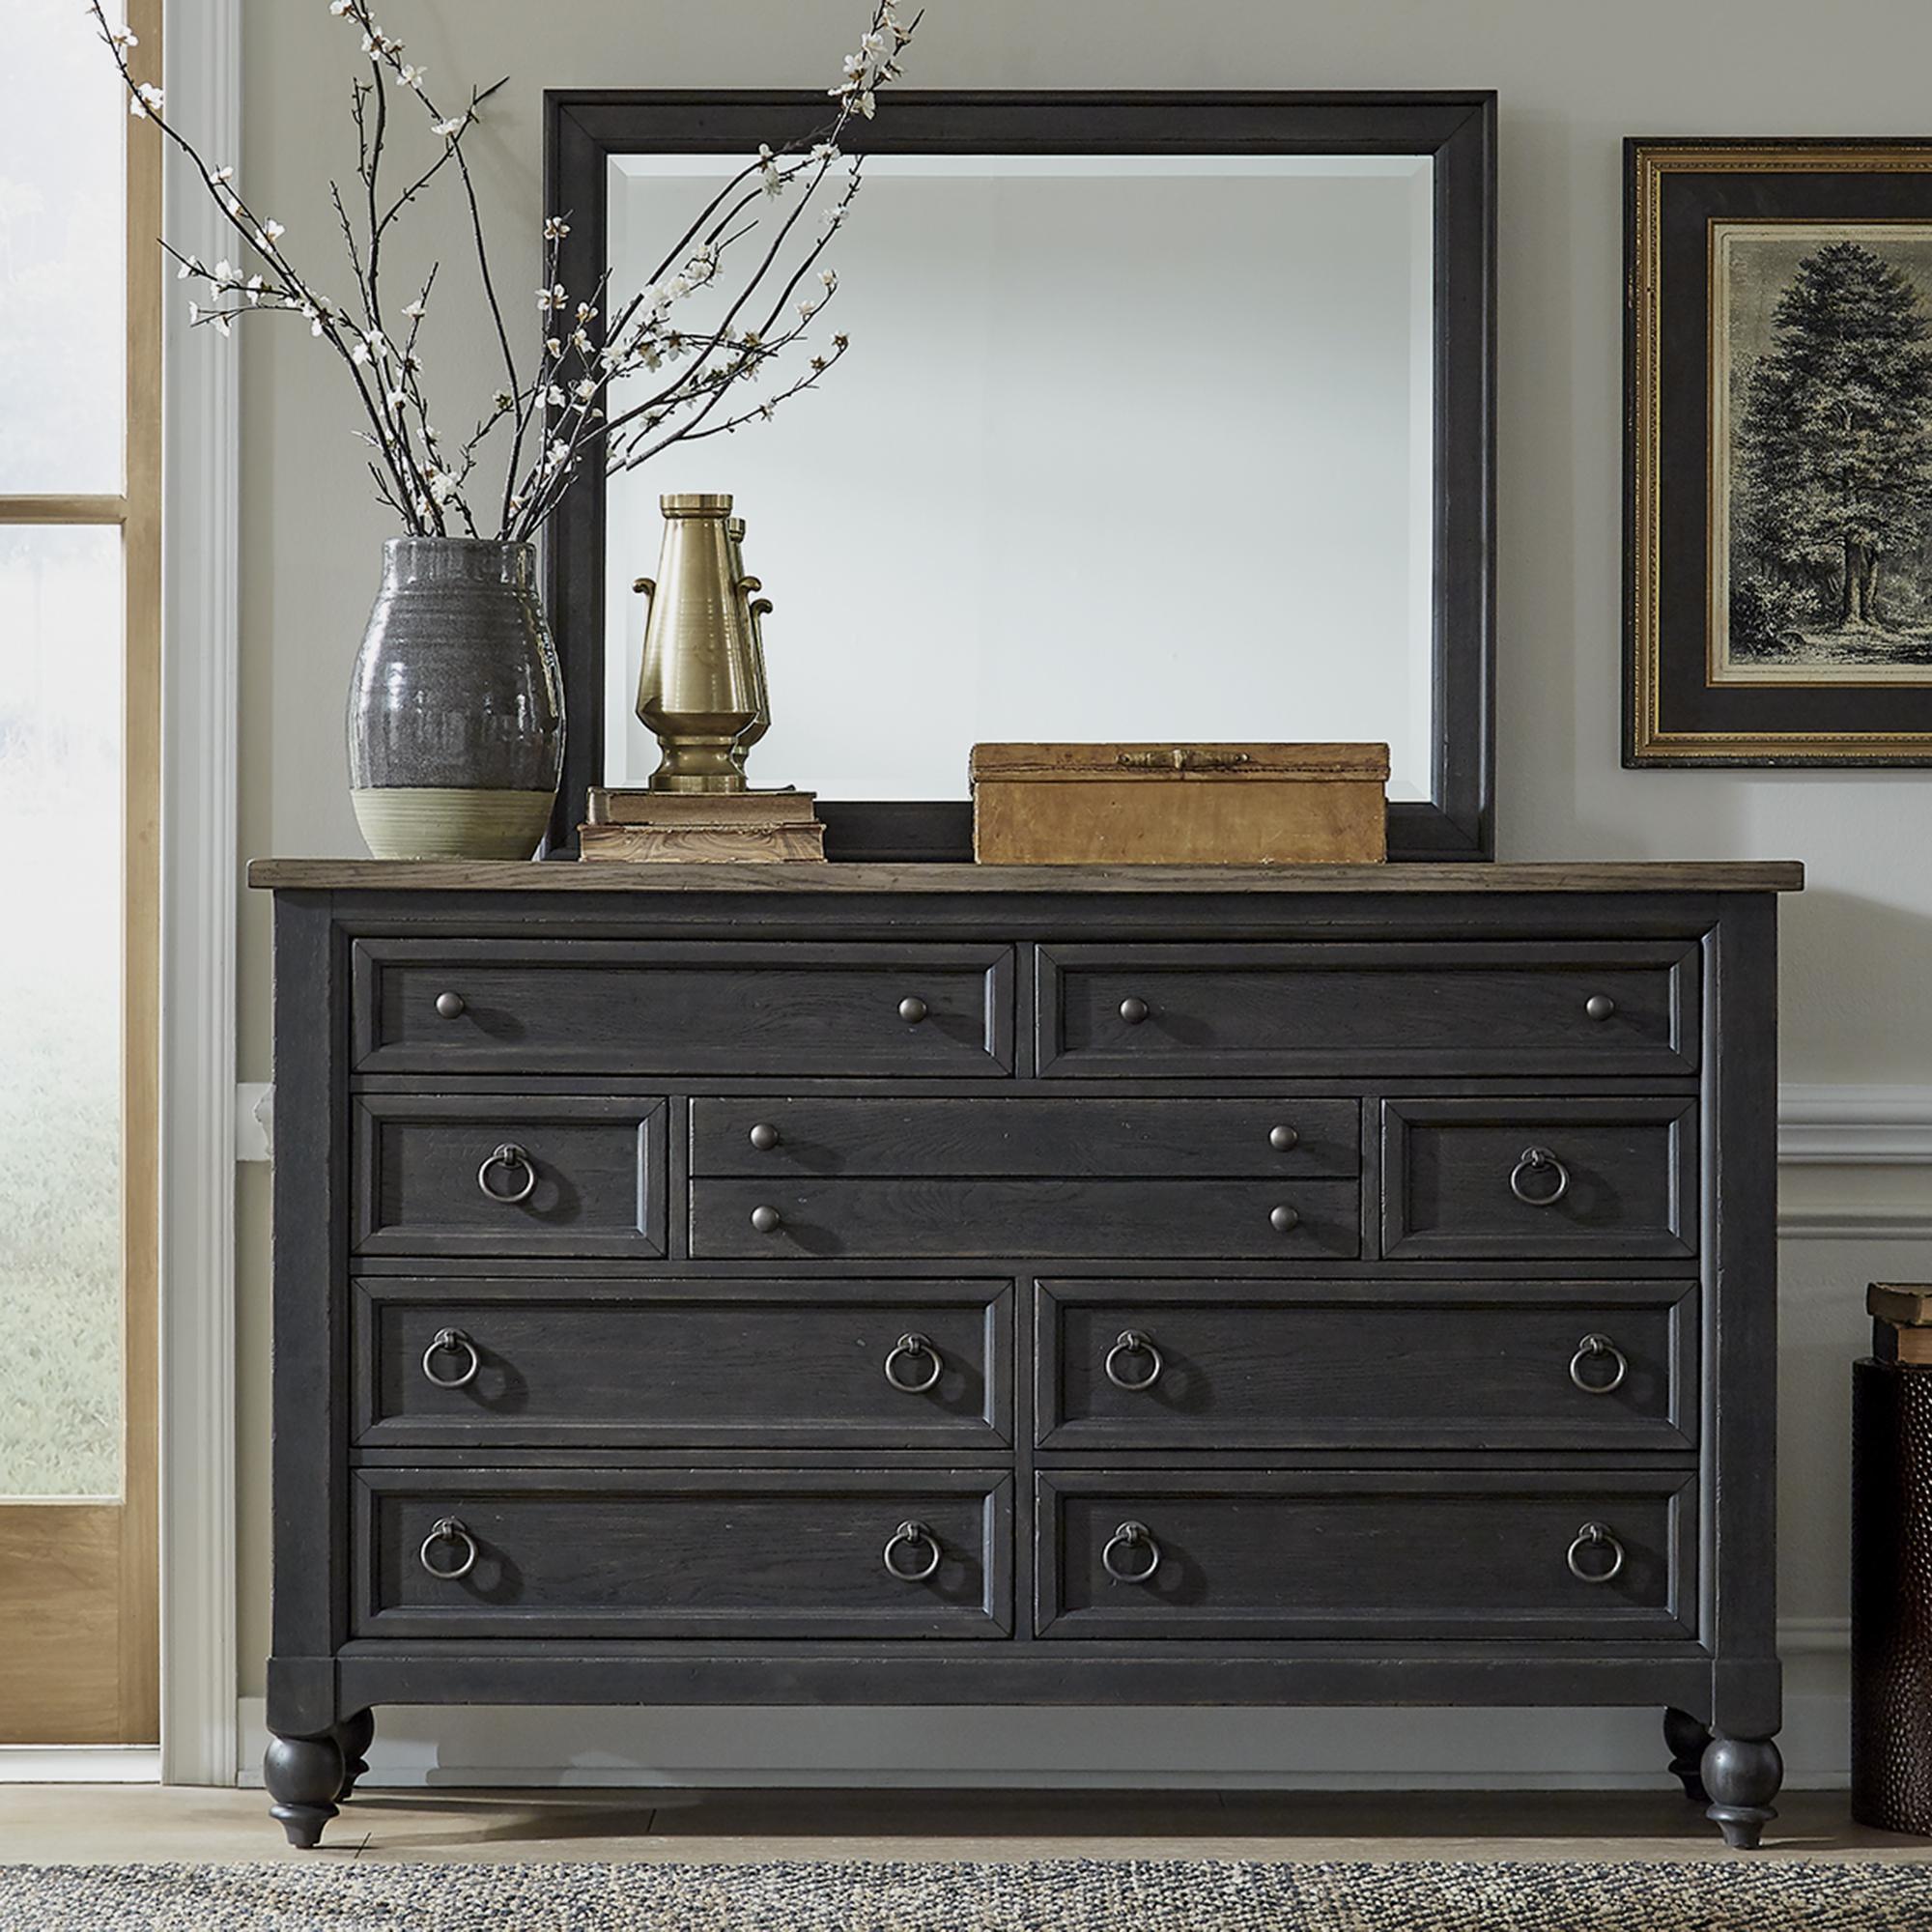 Americana Farmhouse Dressers by Liberty Furniture at Standard Furniture